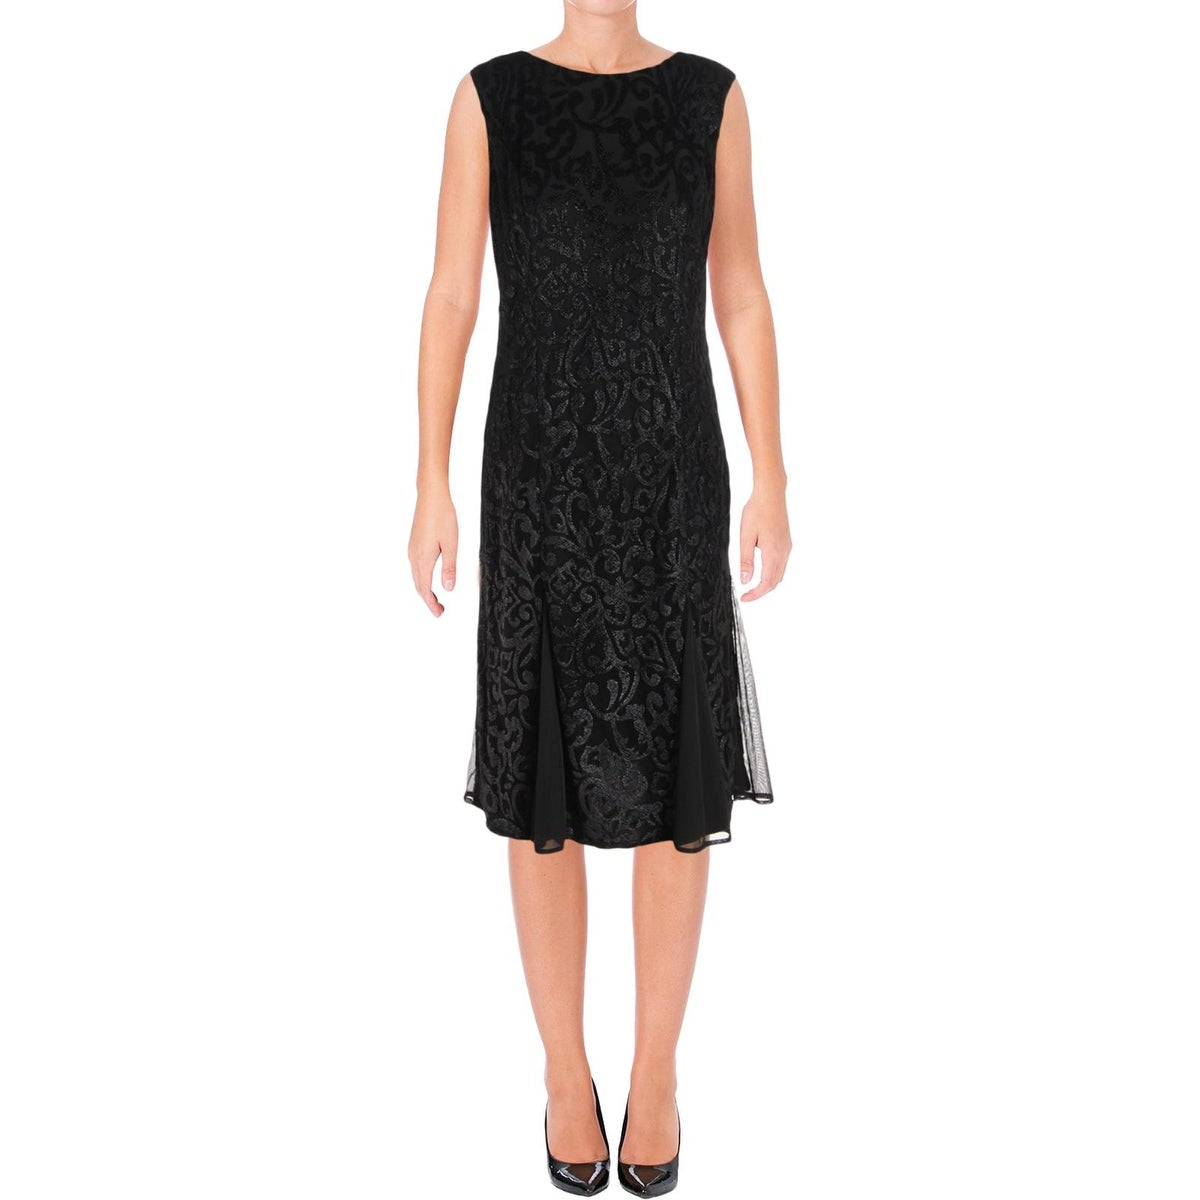 0a7a5bdcfeae Dillards Petite Dresses Clearance